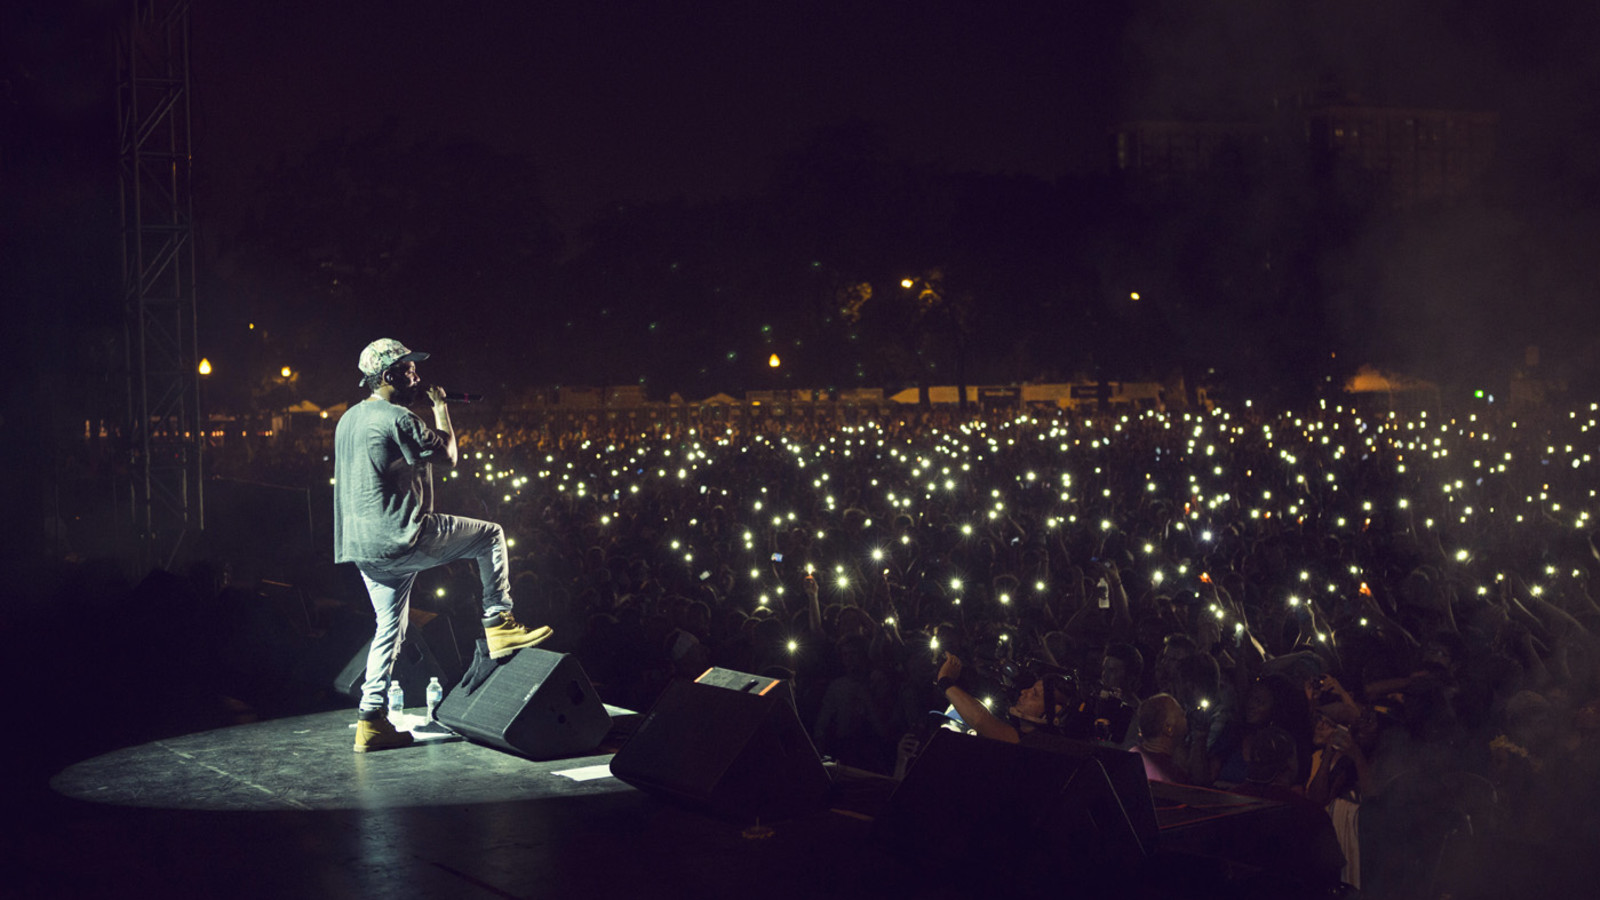 PMF2014 Kendrick Lamar Jessica Lehrman - Adam Krefman - US - Pitchfork Music Festival Chicago